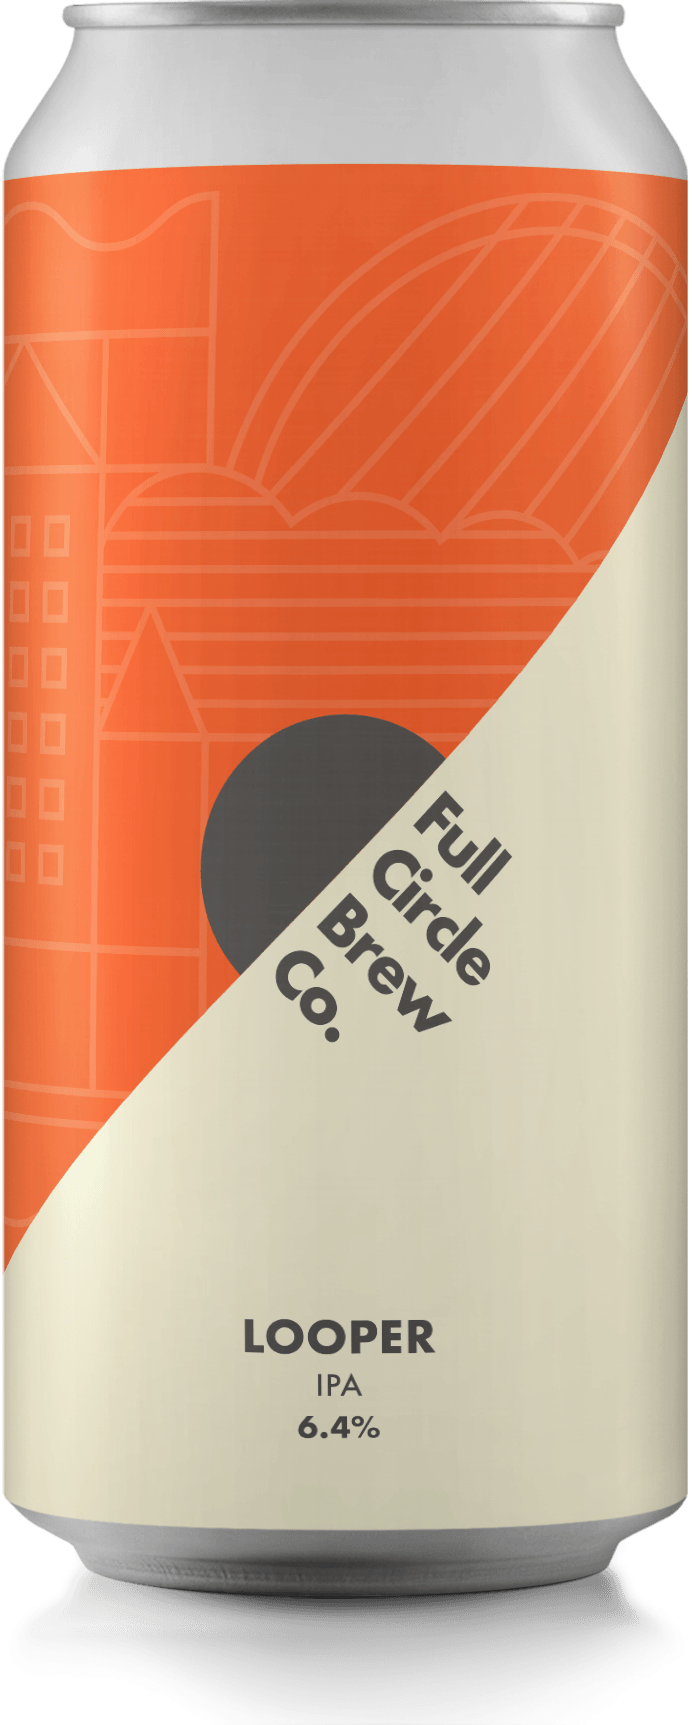 Image 0: FCBC Looper IPA